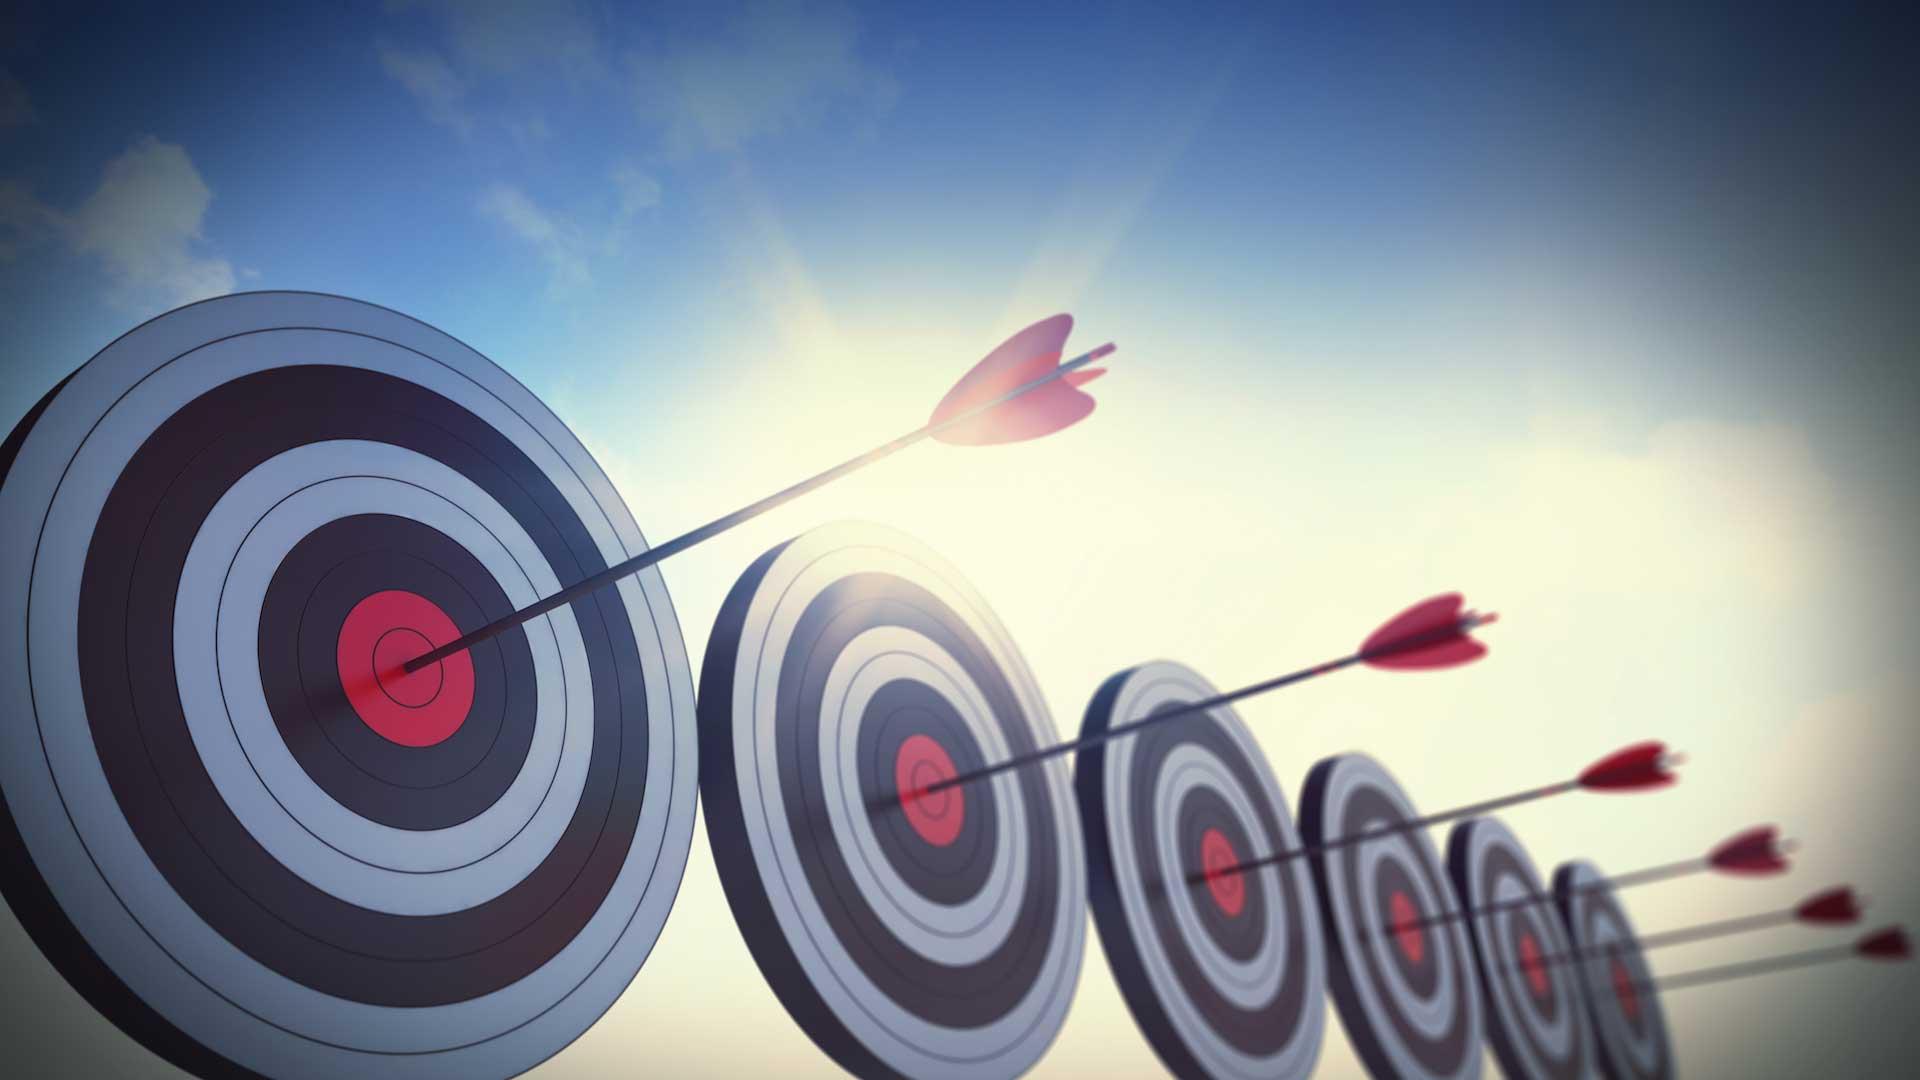 targetswitharrows_ss_1920